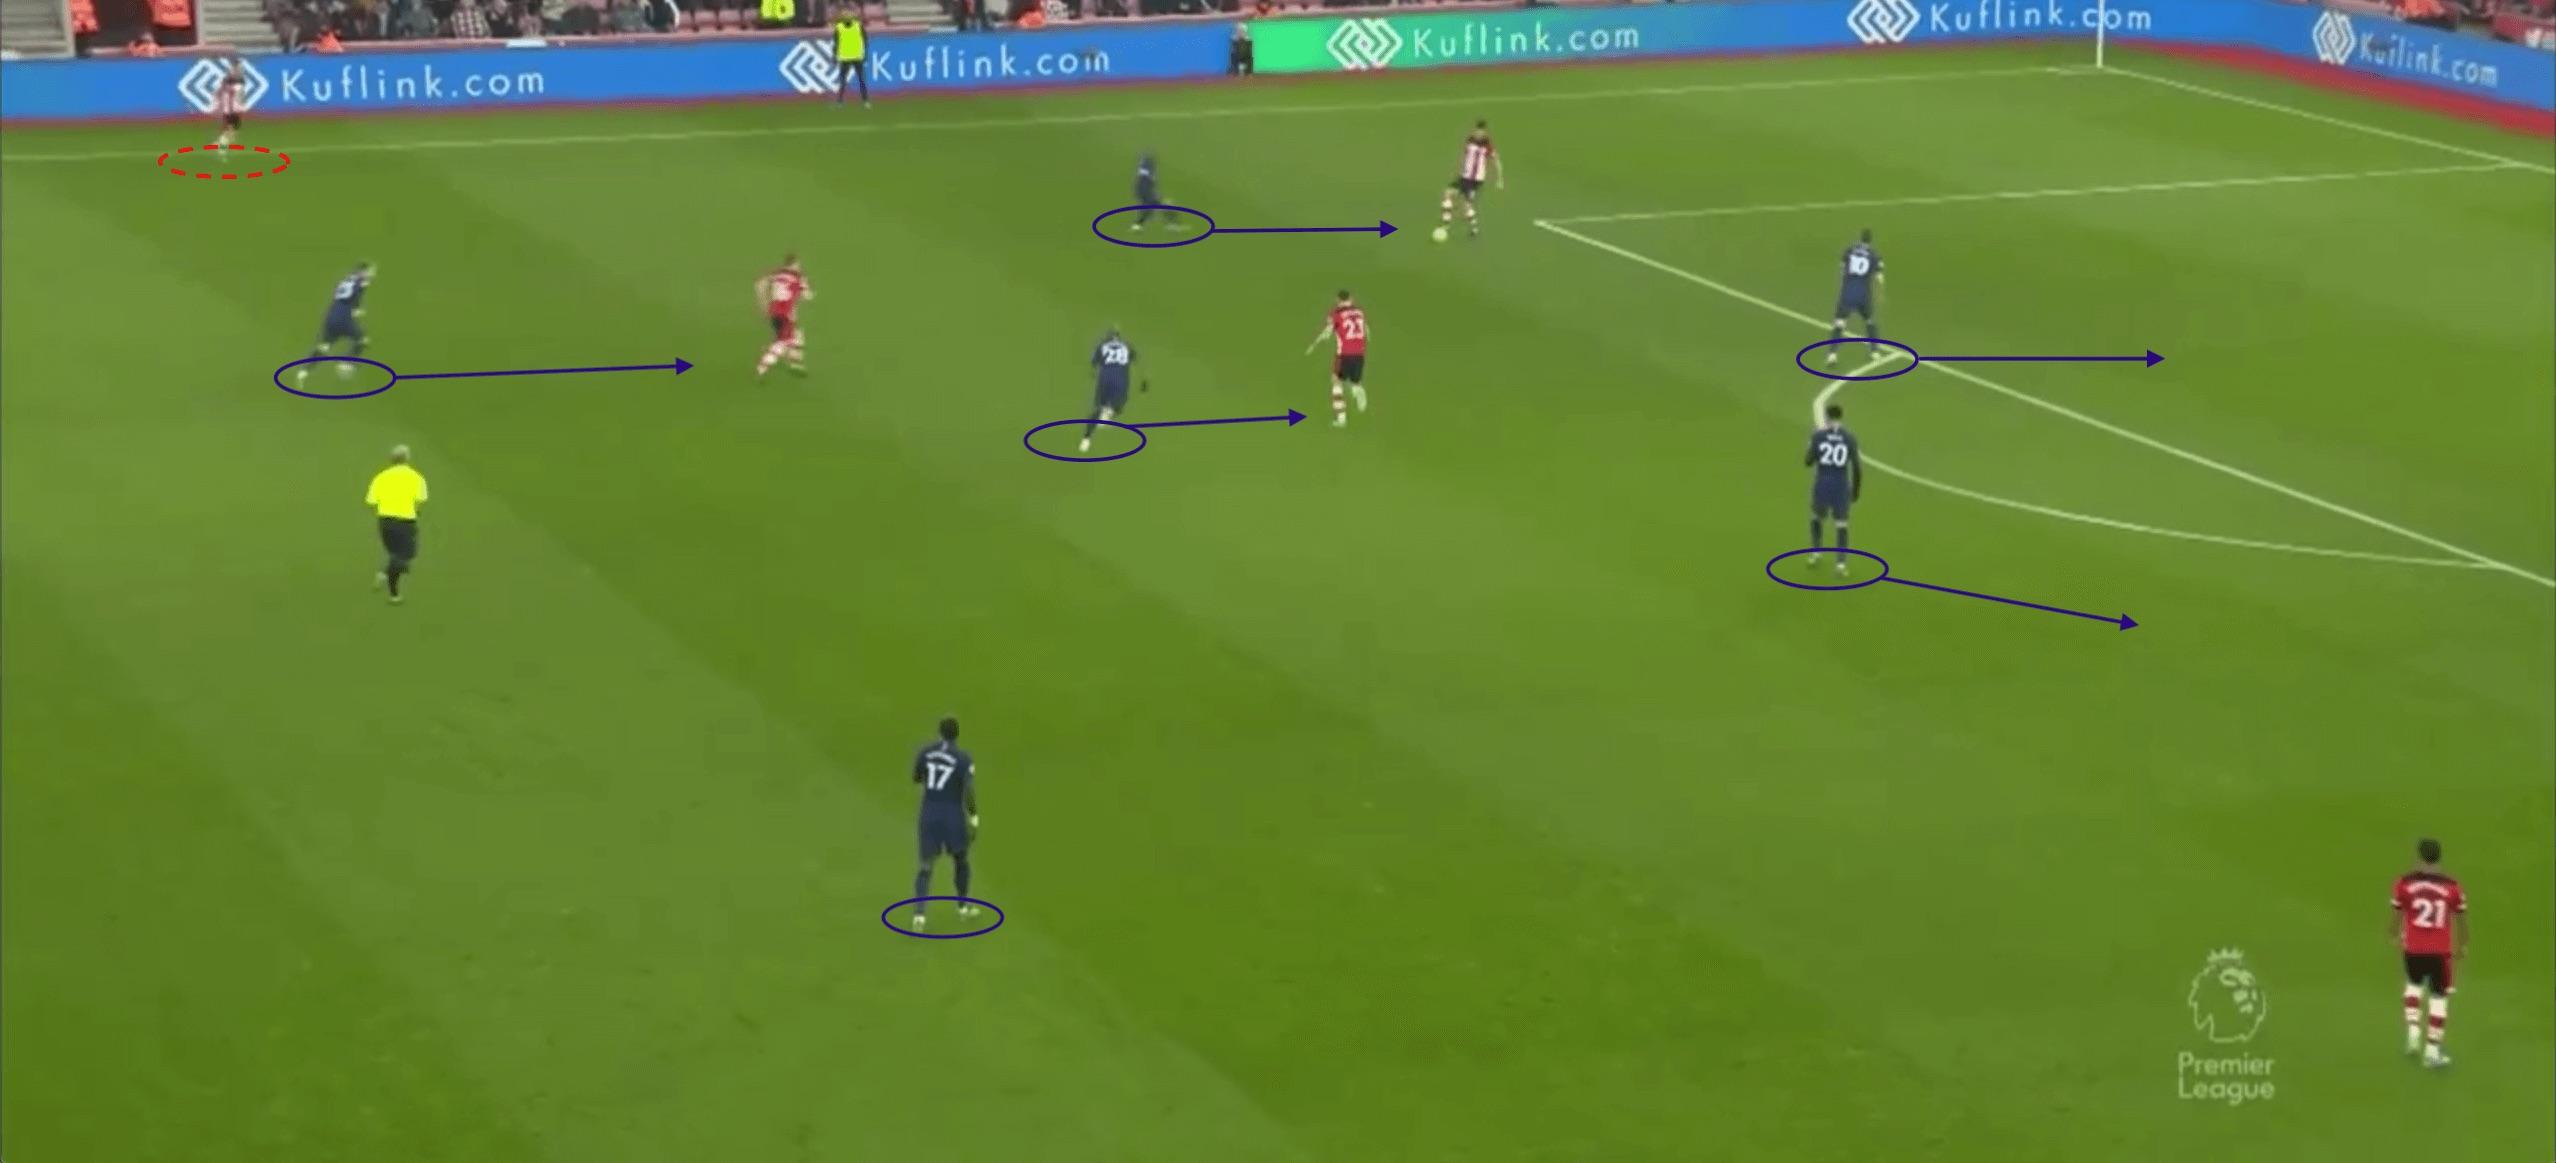 Premier League 2019/20: Southampton vs Tottenham - tactical analysis tactics